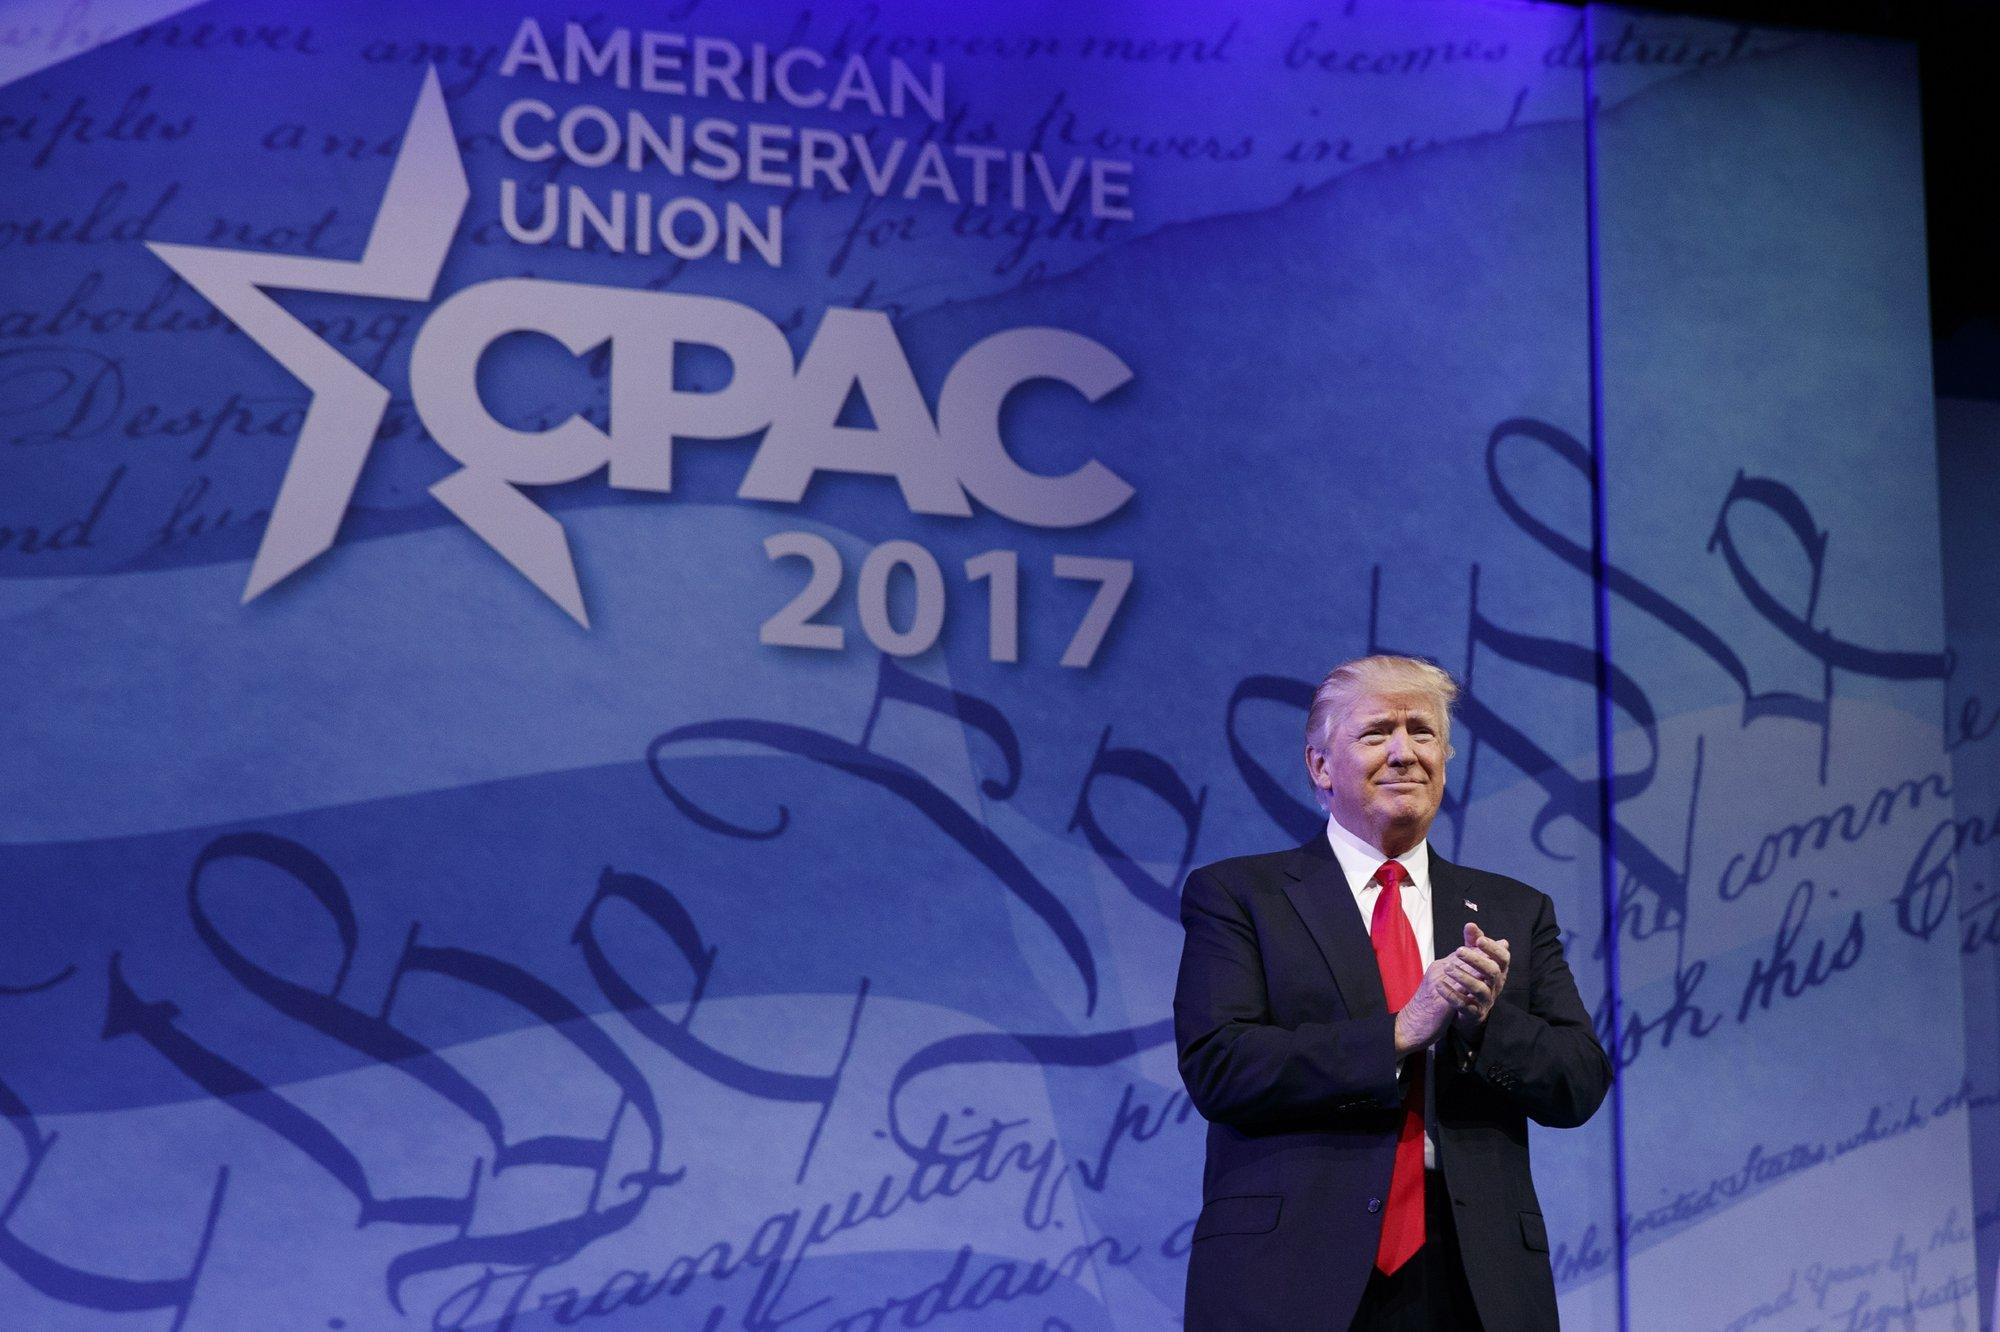 AP FACT CHECK: Trump considers 20 million people 'very few'